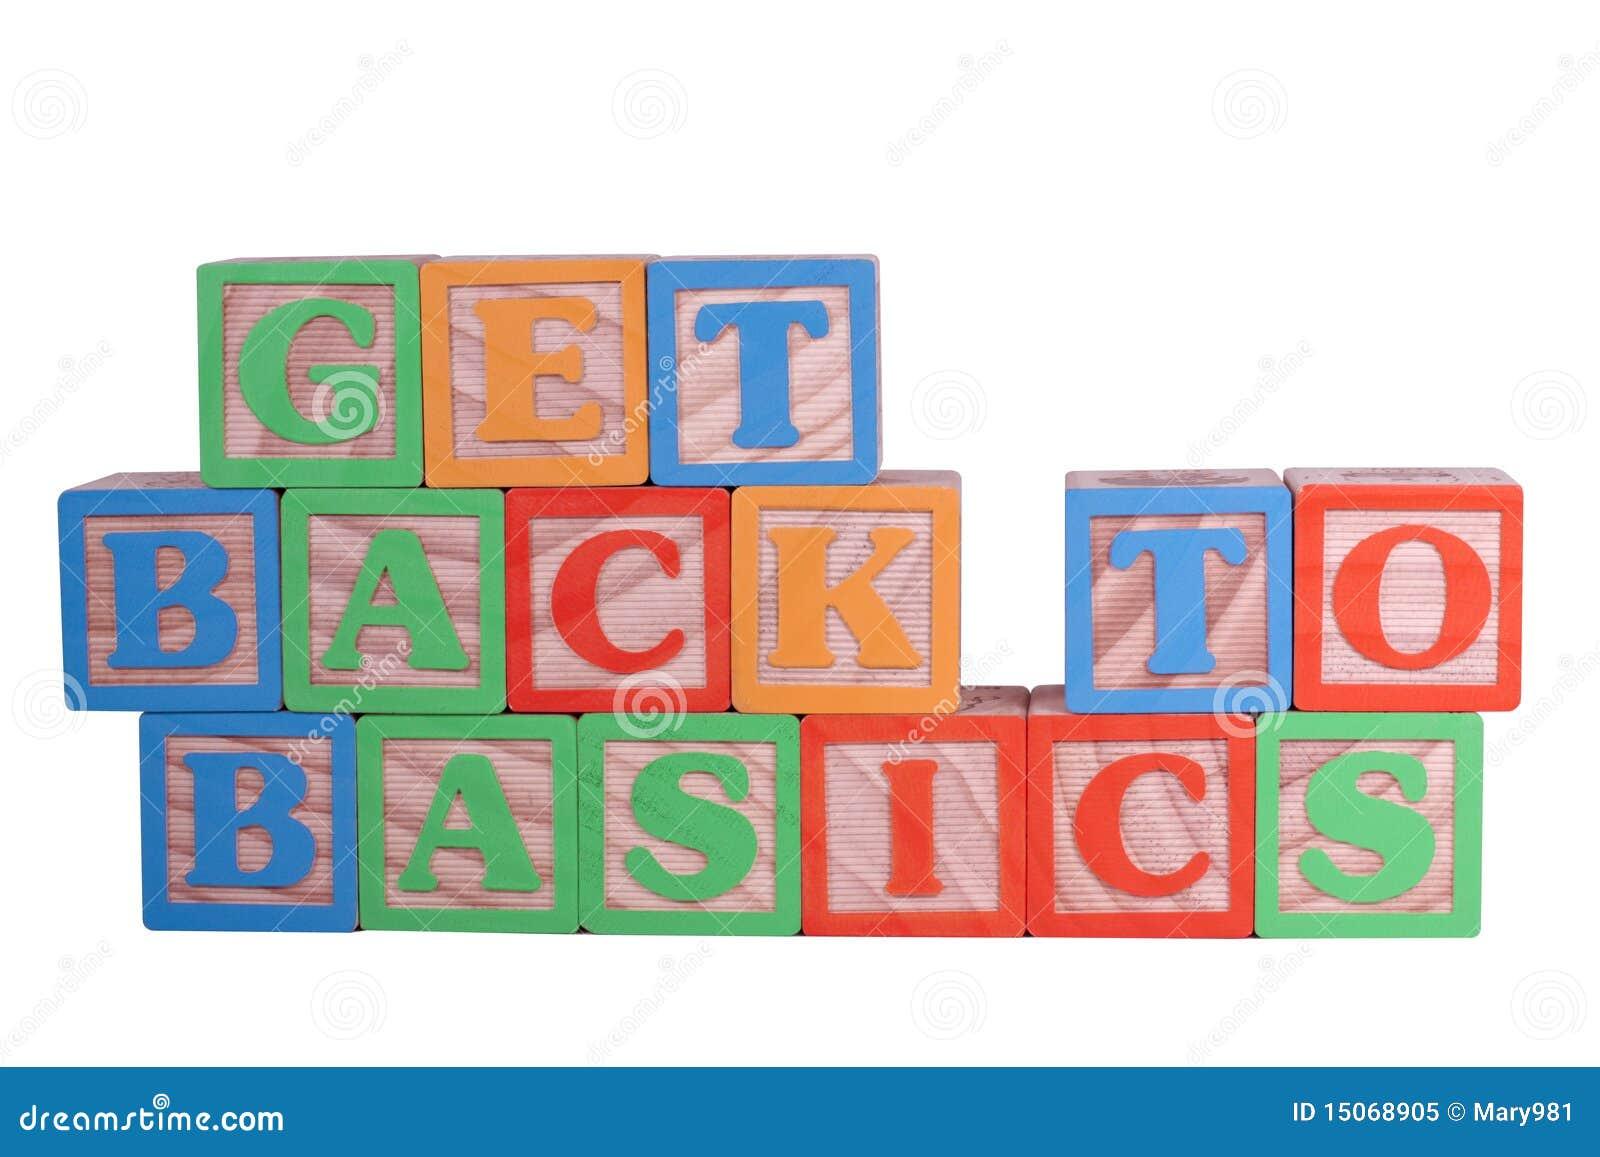 get back to basics royalty free stock photo image 15068905. Black Bedroom Furniture Sets. Home Design Ideas